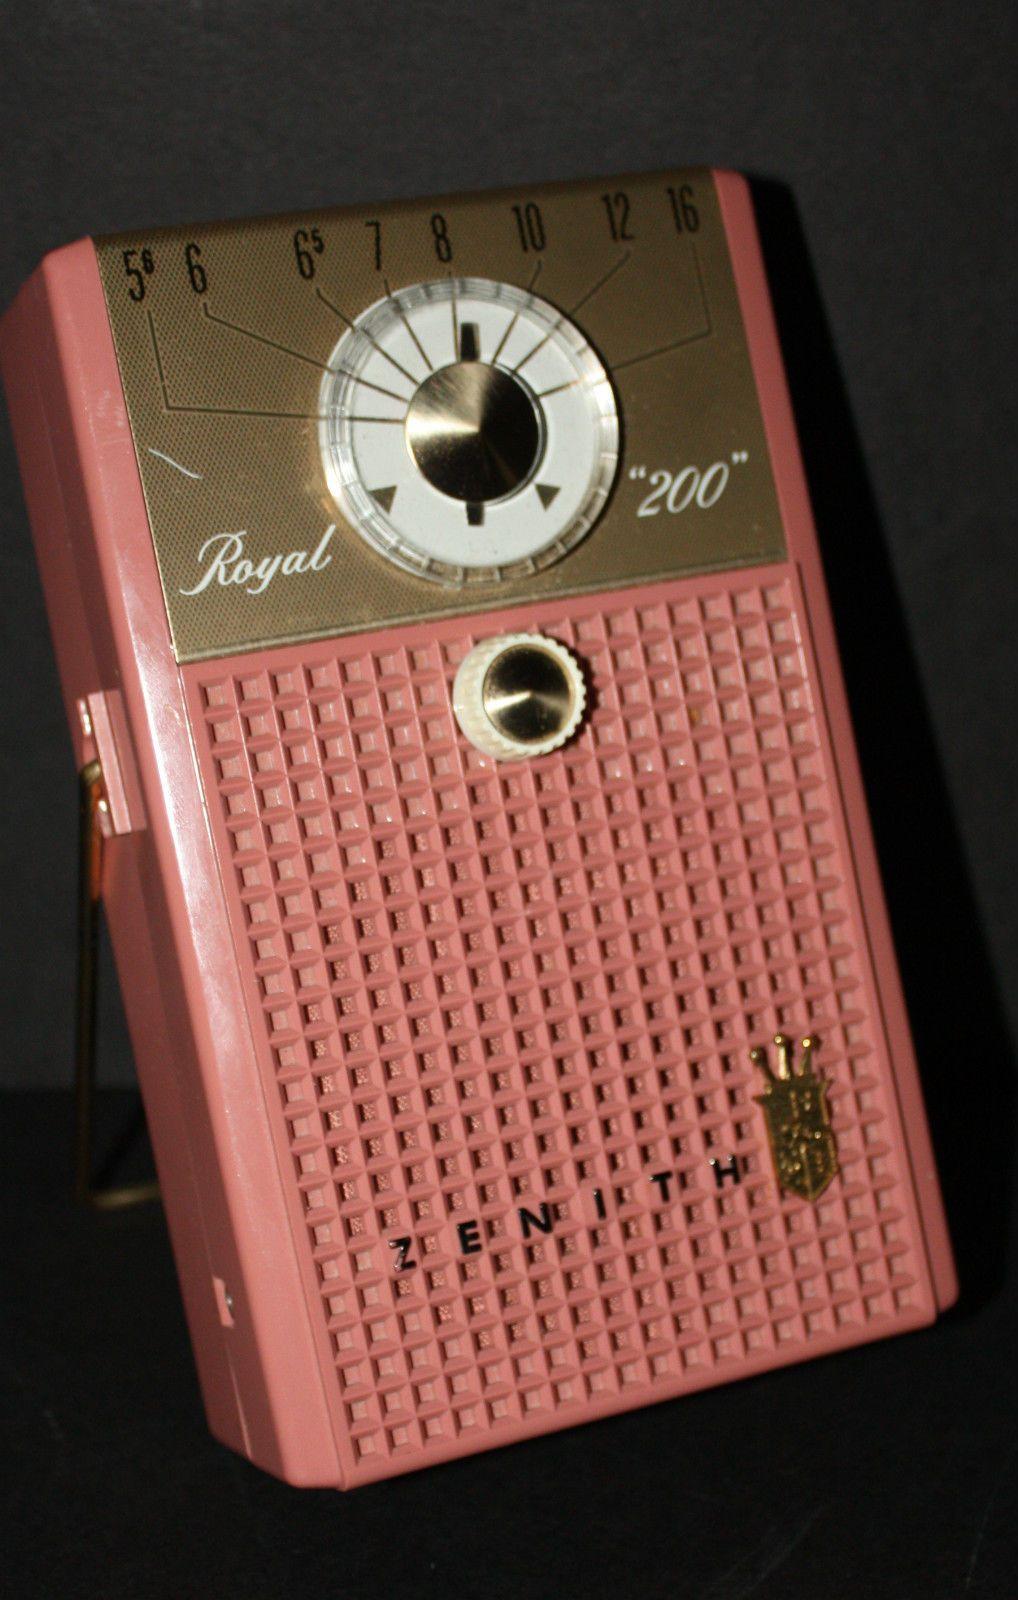 Radio Schematics Additionally Radio Collection On Zenith Transistor